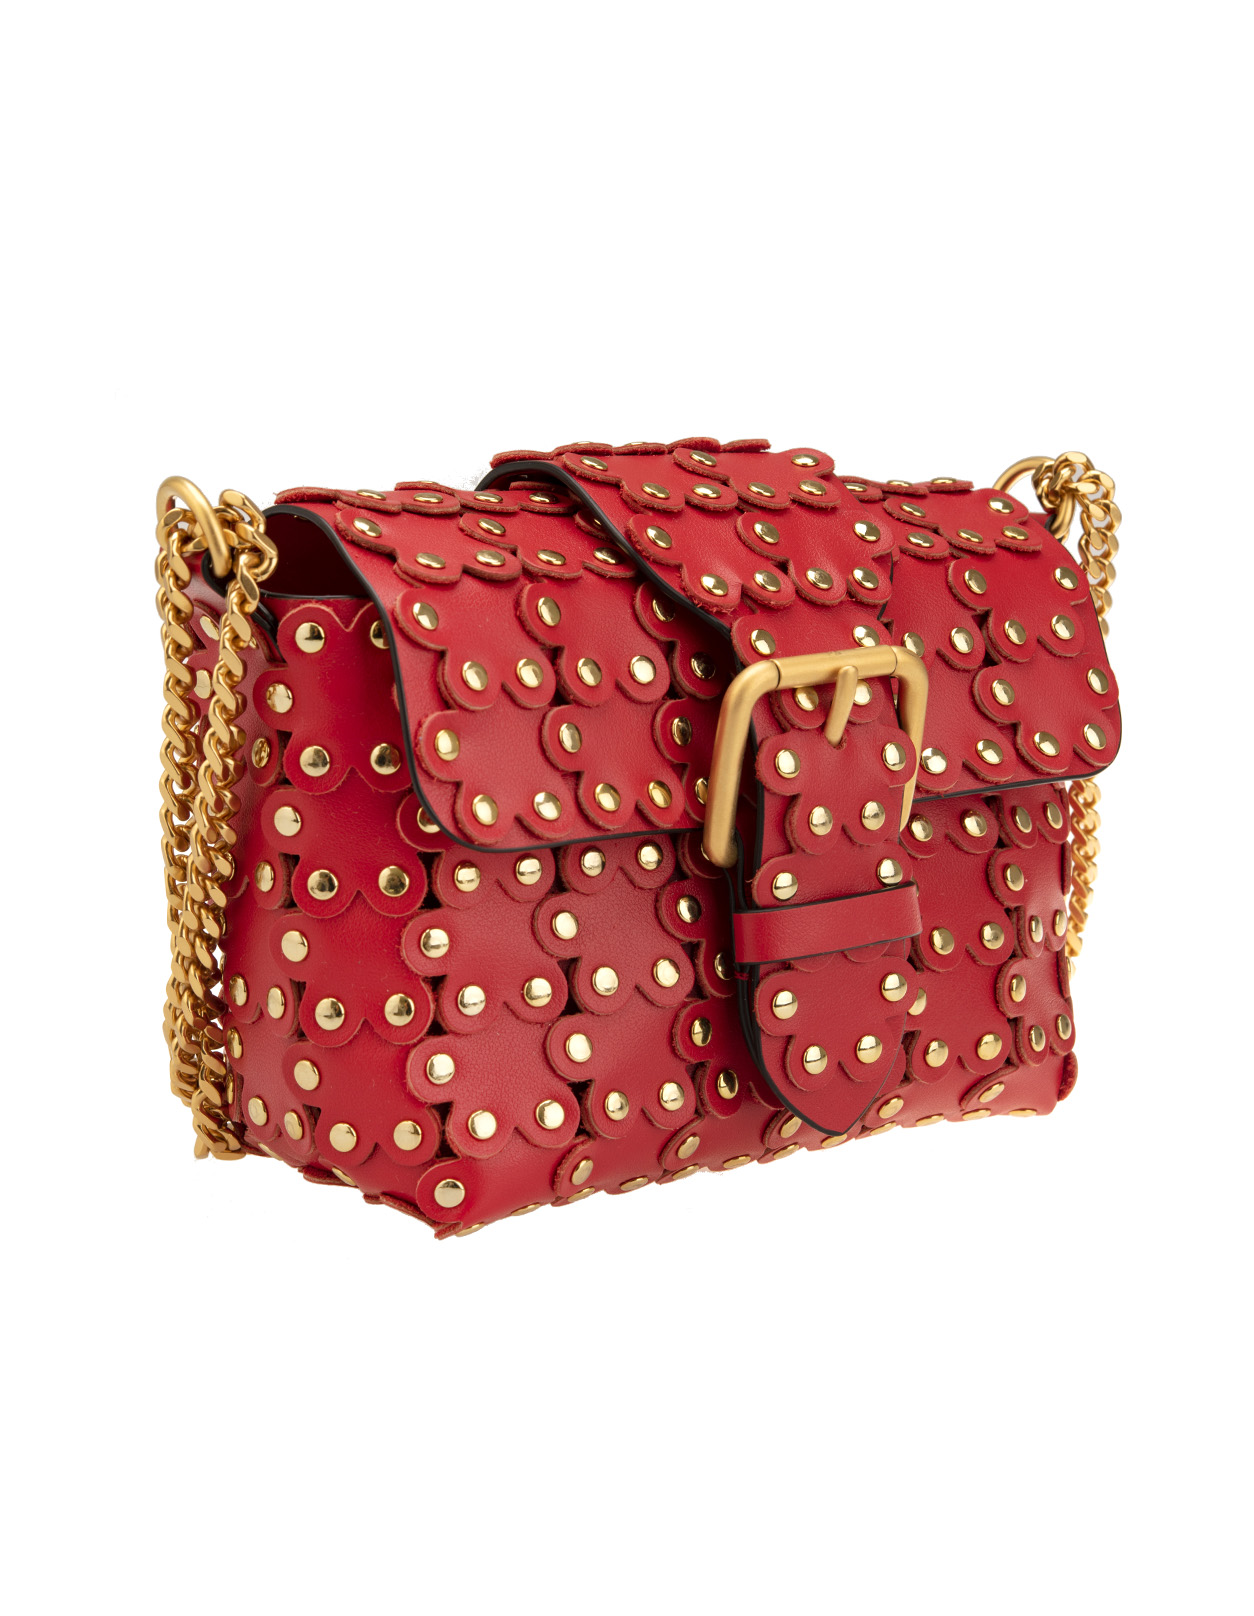 4519cfb526 Flower Puzzle Bag - RED VALENTINO - Russocapri